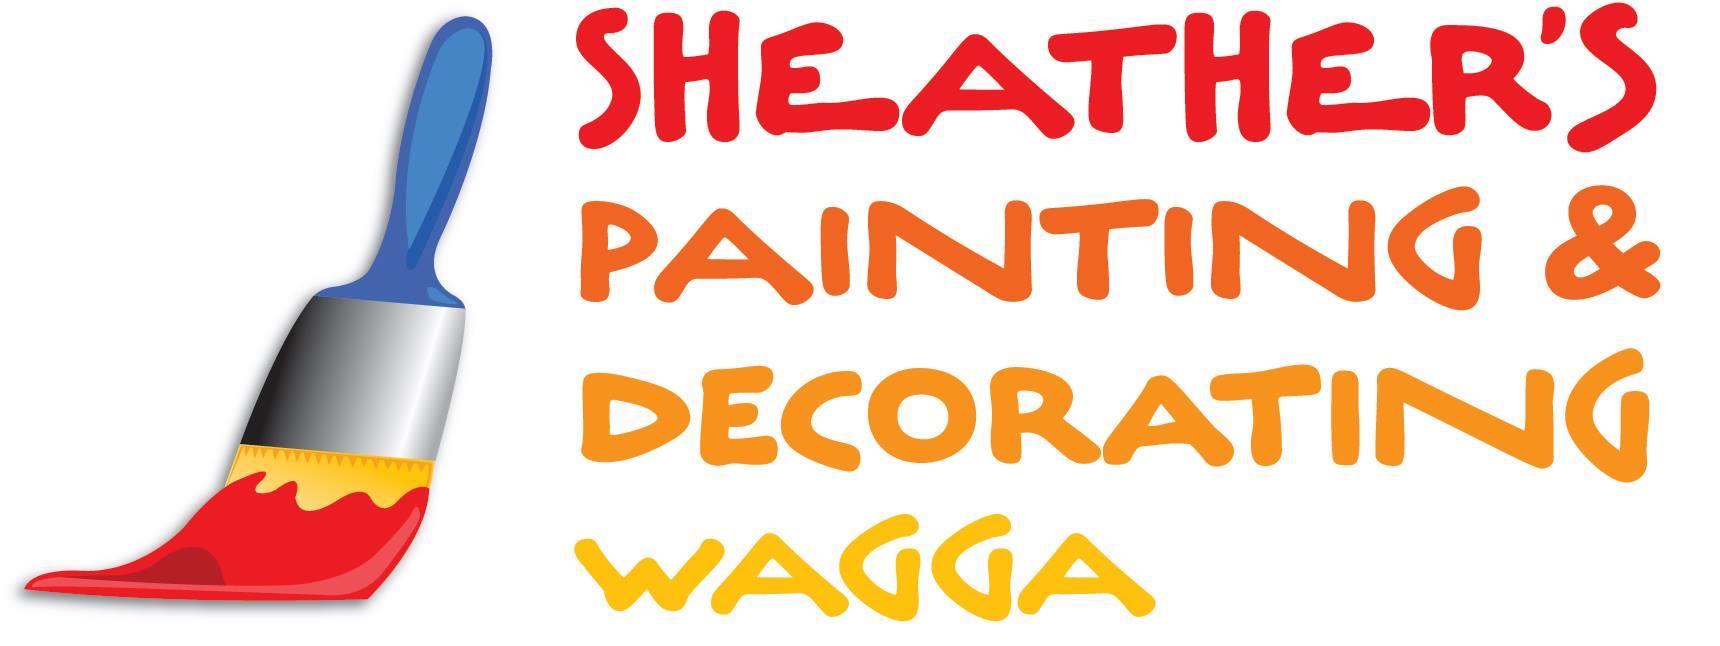 Sheather's Painting & Decorating